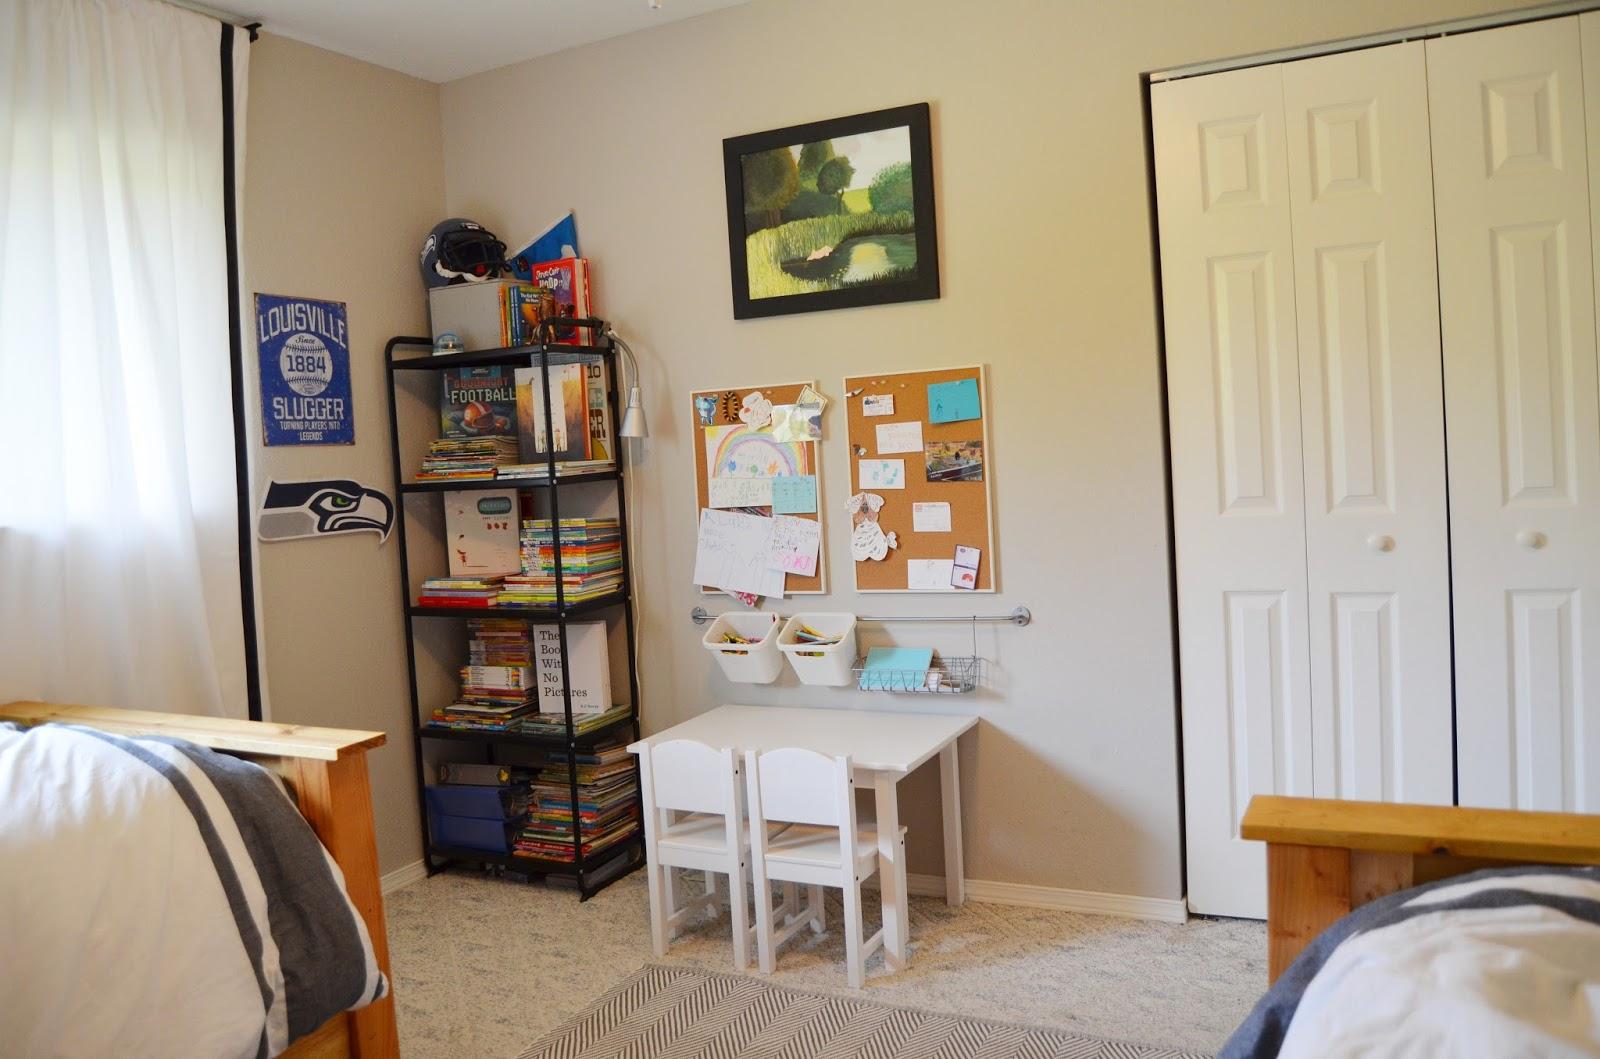 Source List: Walls (Benjamin Moore Revere Pewter HC 172); Trim, Closet U0026  Ceiling (Benjamin Moore Simply White OC 117); Beds (DIY | Home Depot |  Build ...